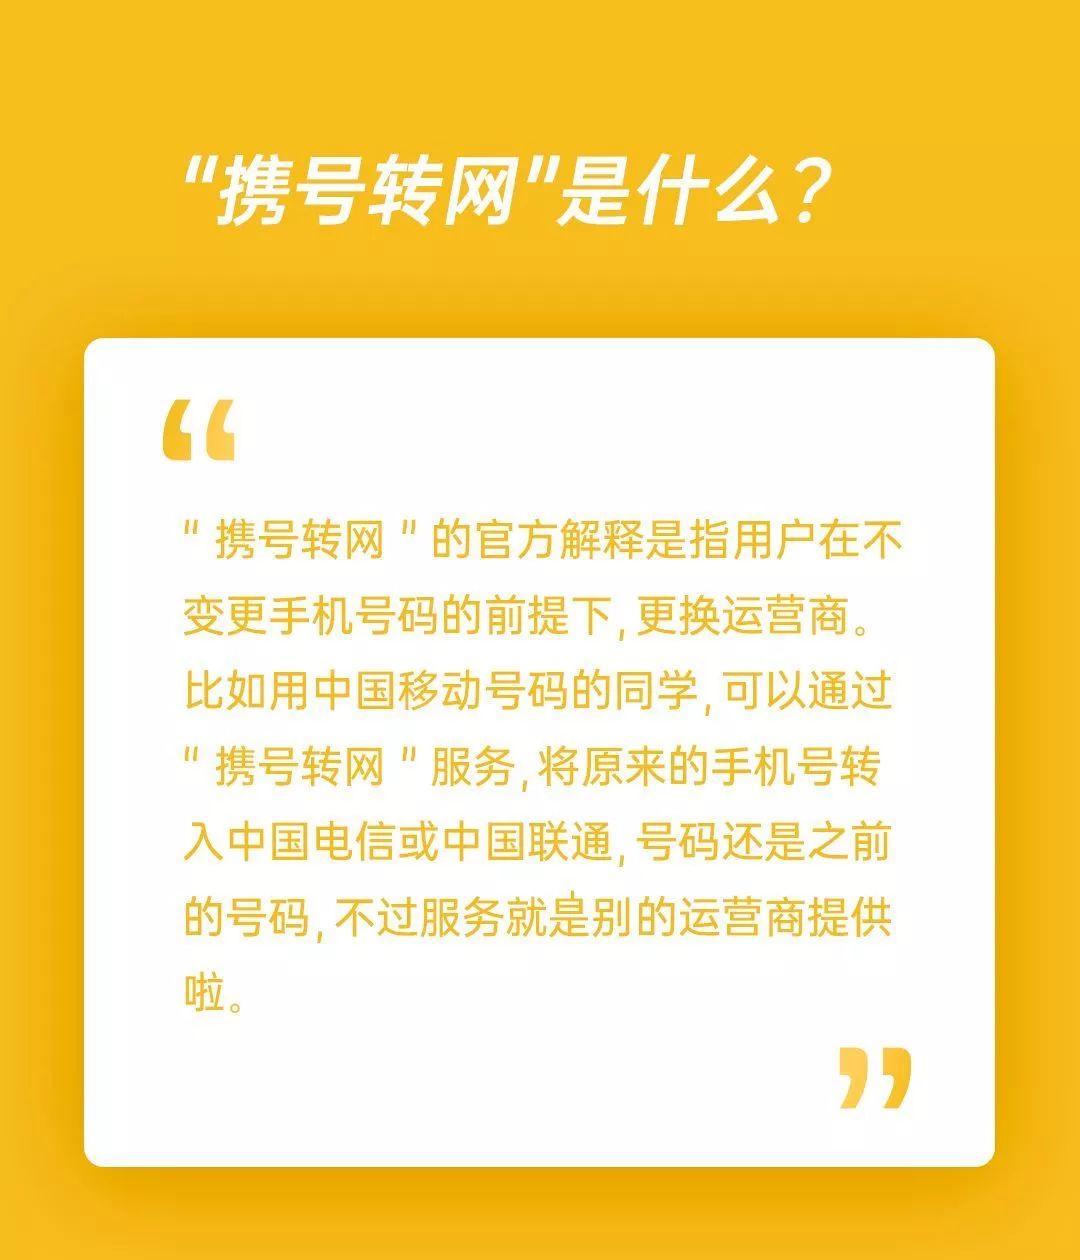 http://www.msbmw.net/qichexiaofei/18625.html